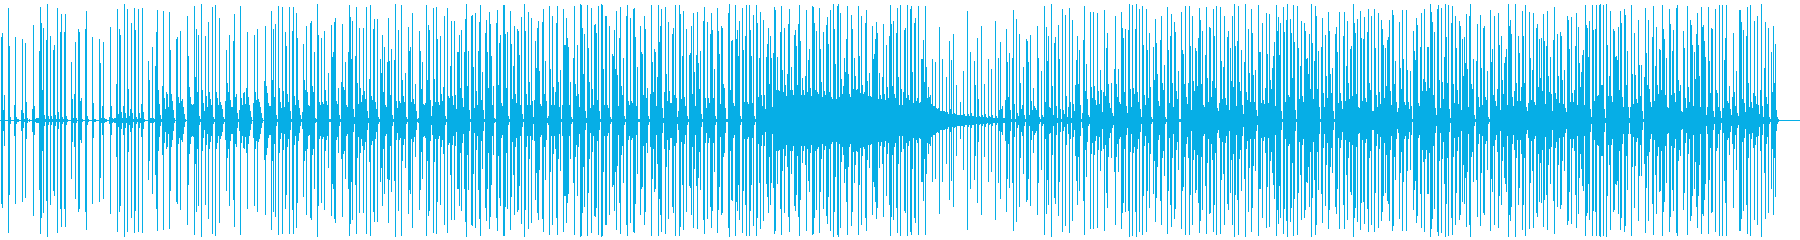 Shells Songの再生済みの波形